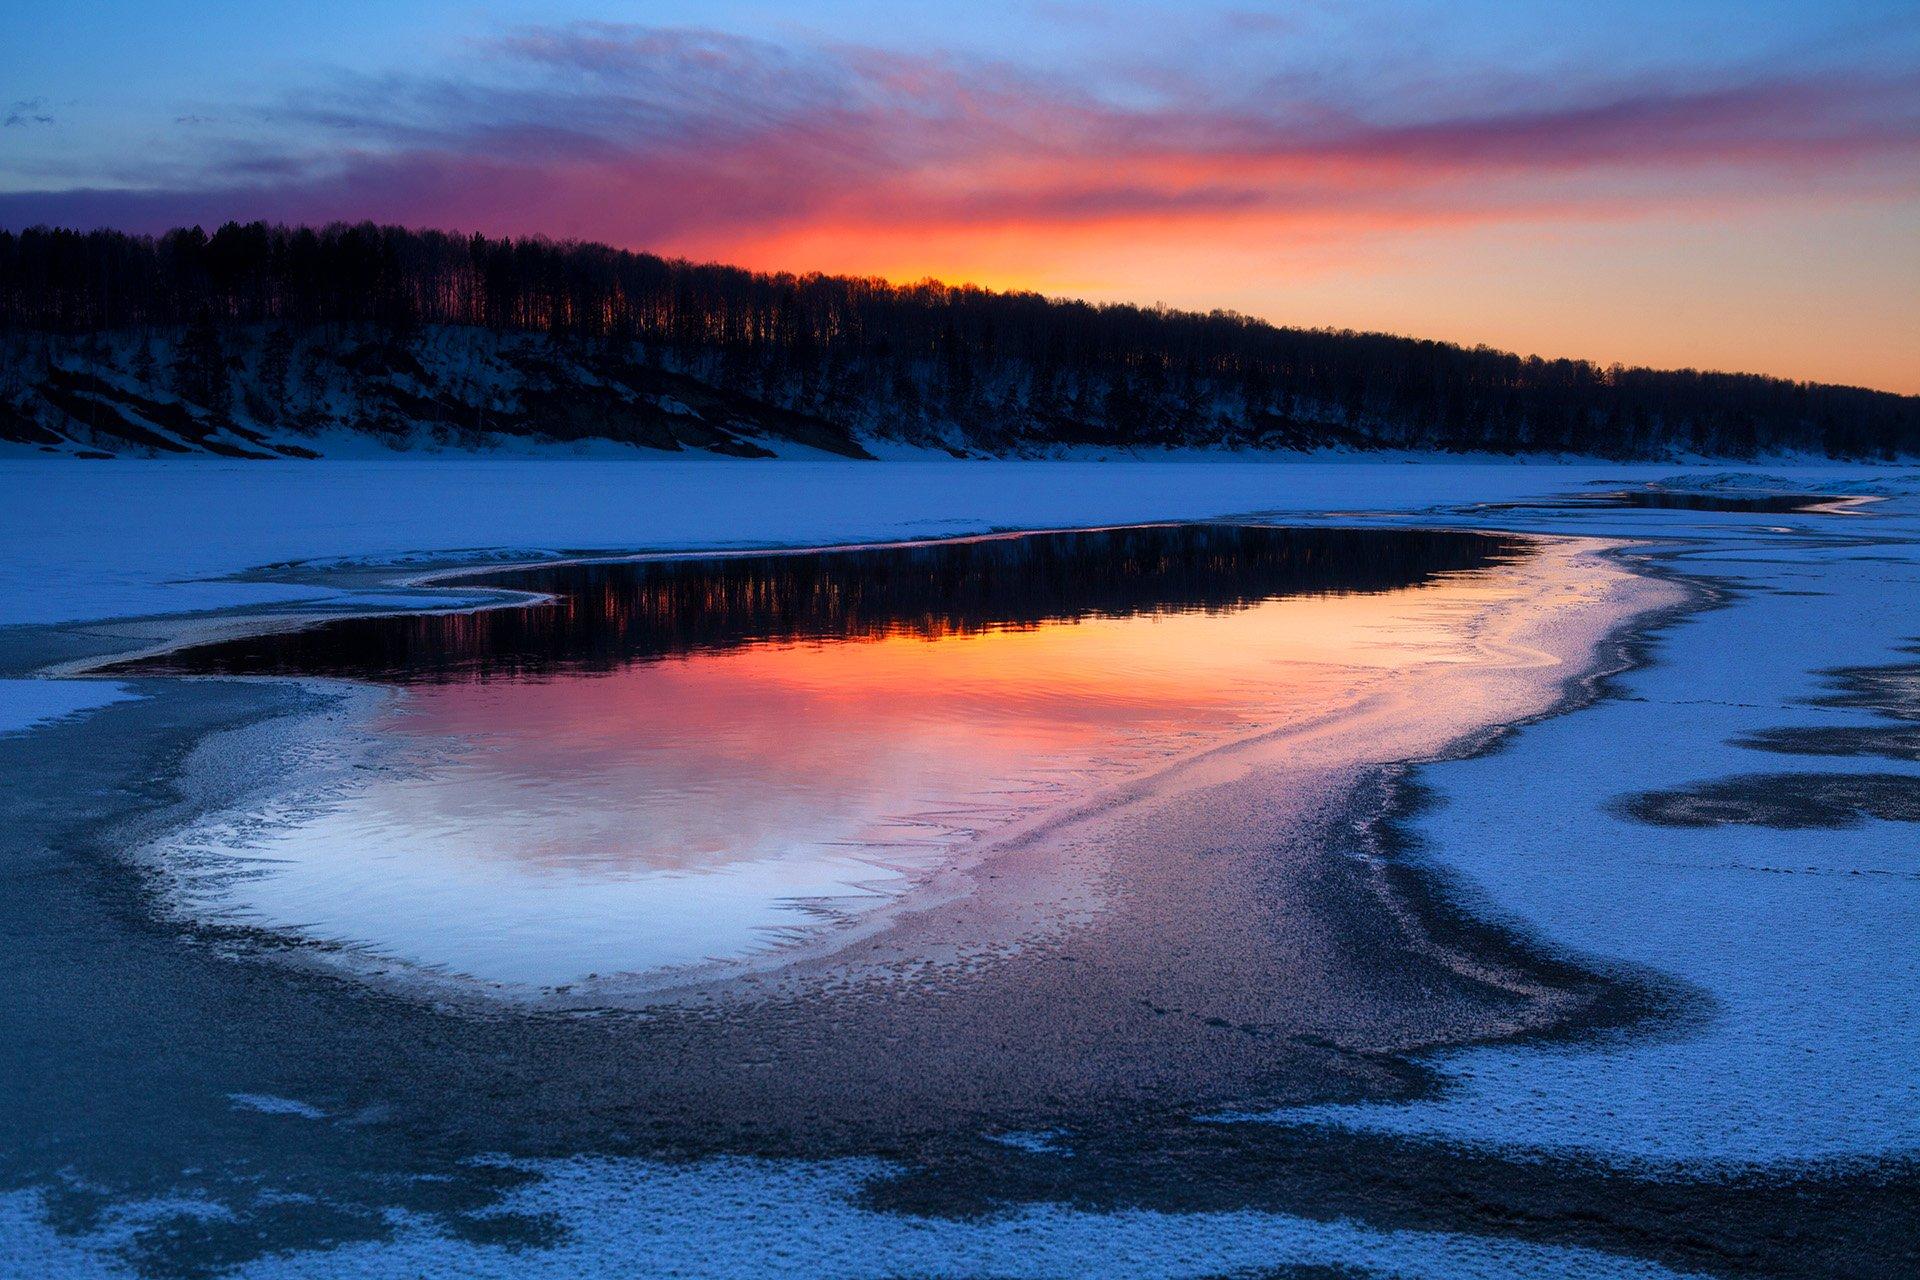 пейзаж, закат, река,весна., Андрей Васильченко